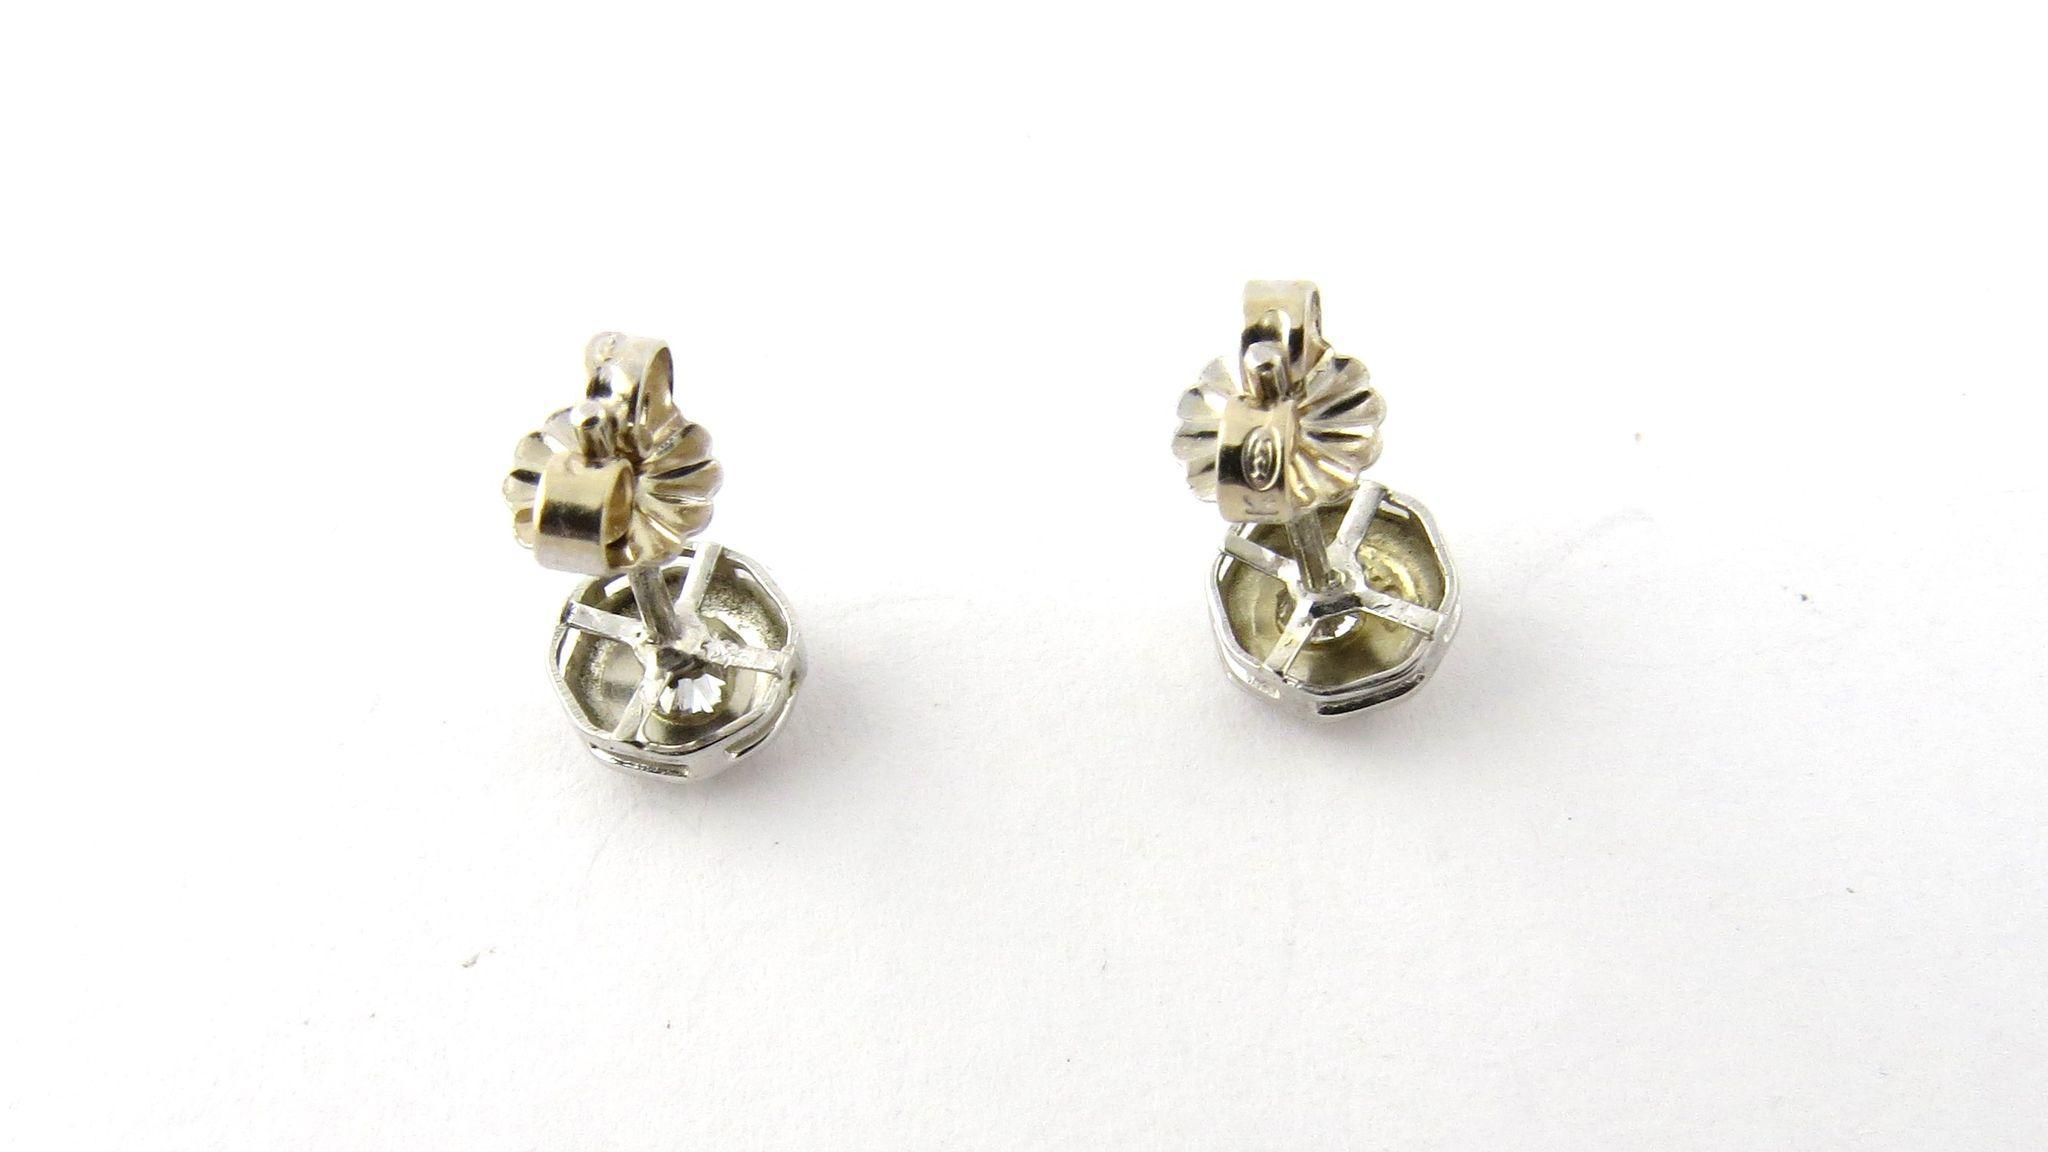 Vintage 14K White Gold Octagon European Cut Diamond Stud Earrings